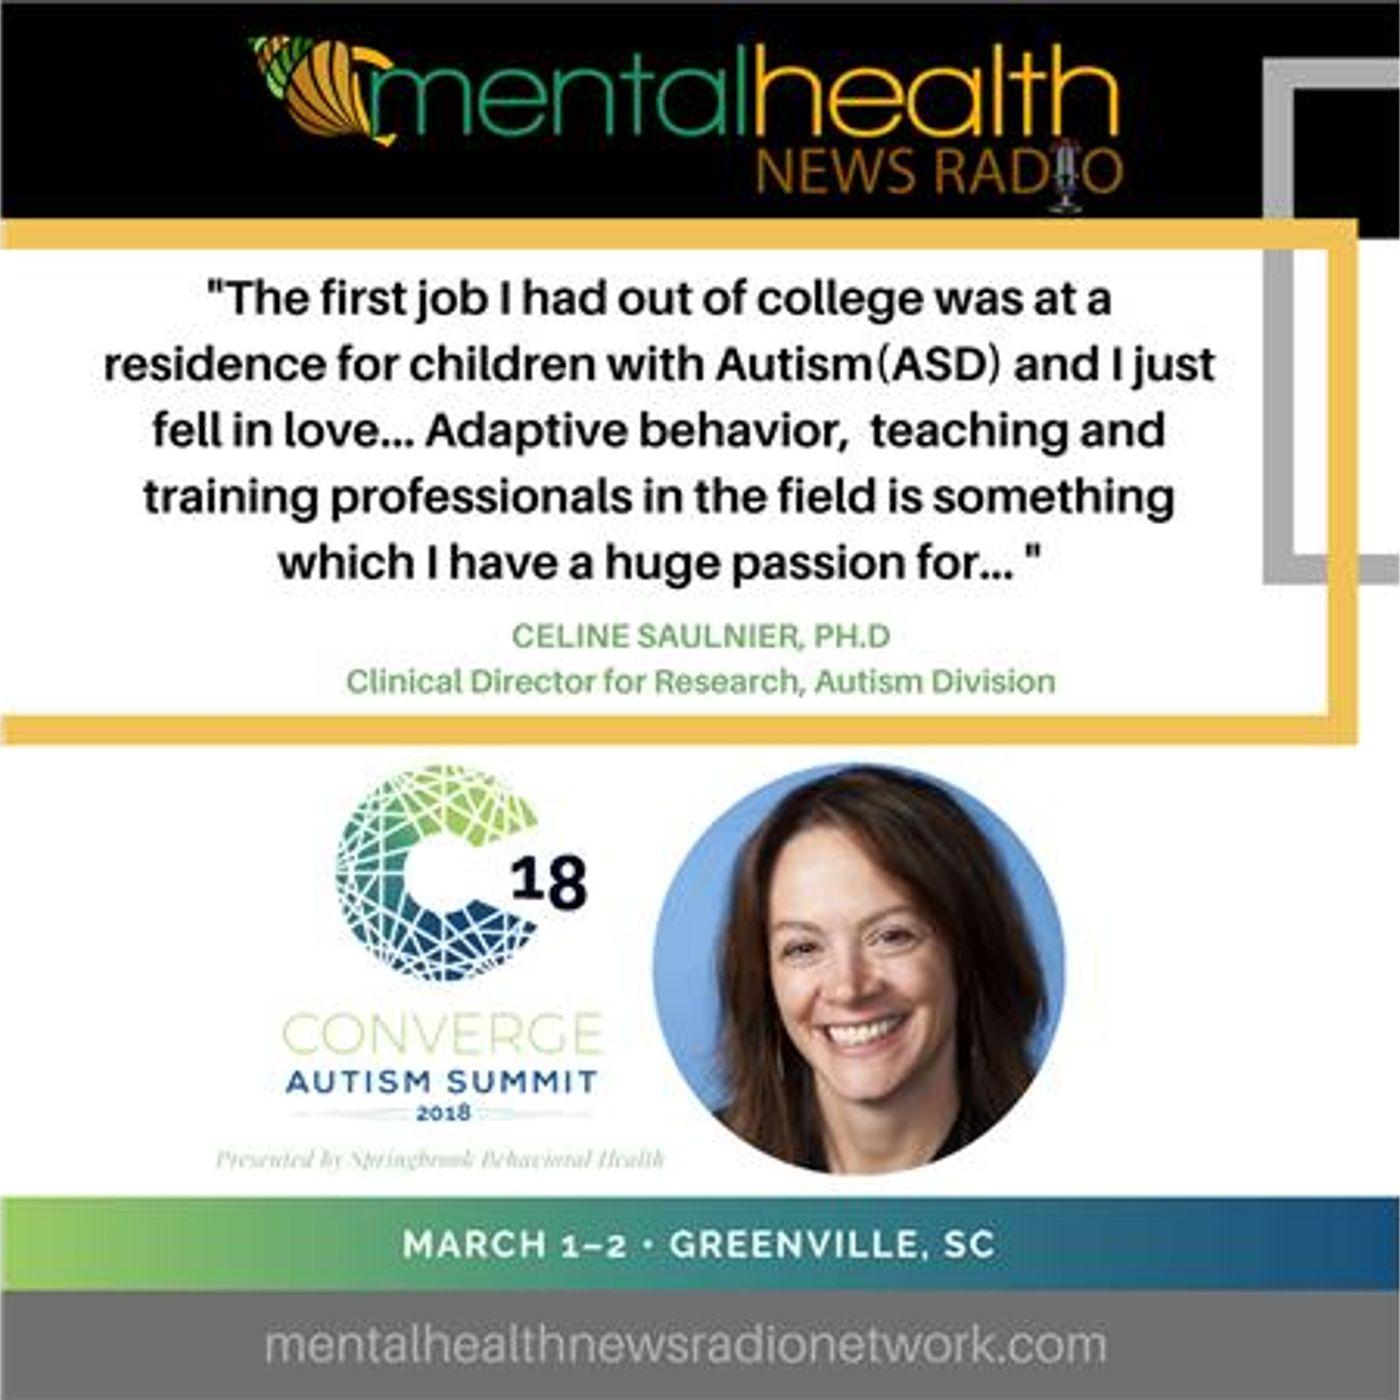 Mental Health News Radio - Autism: Applying Adaptive Skills for Real Life with Celine Saulnier, PhD